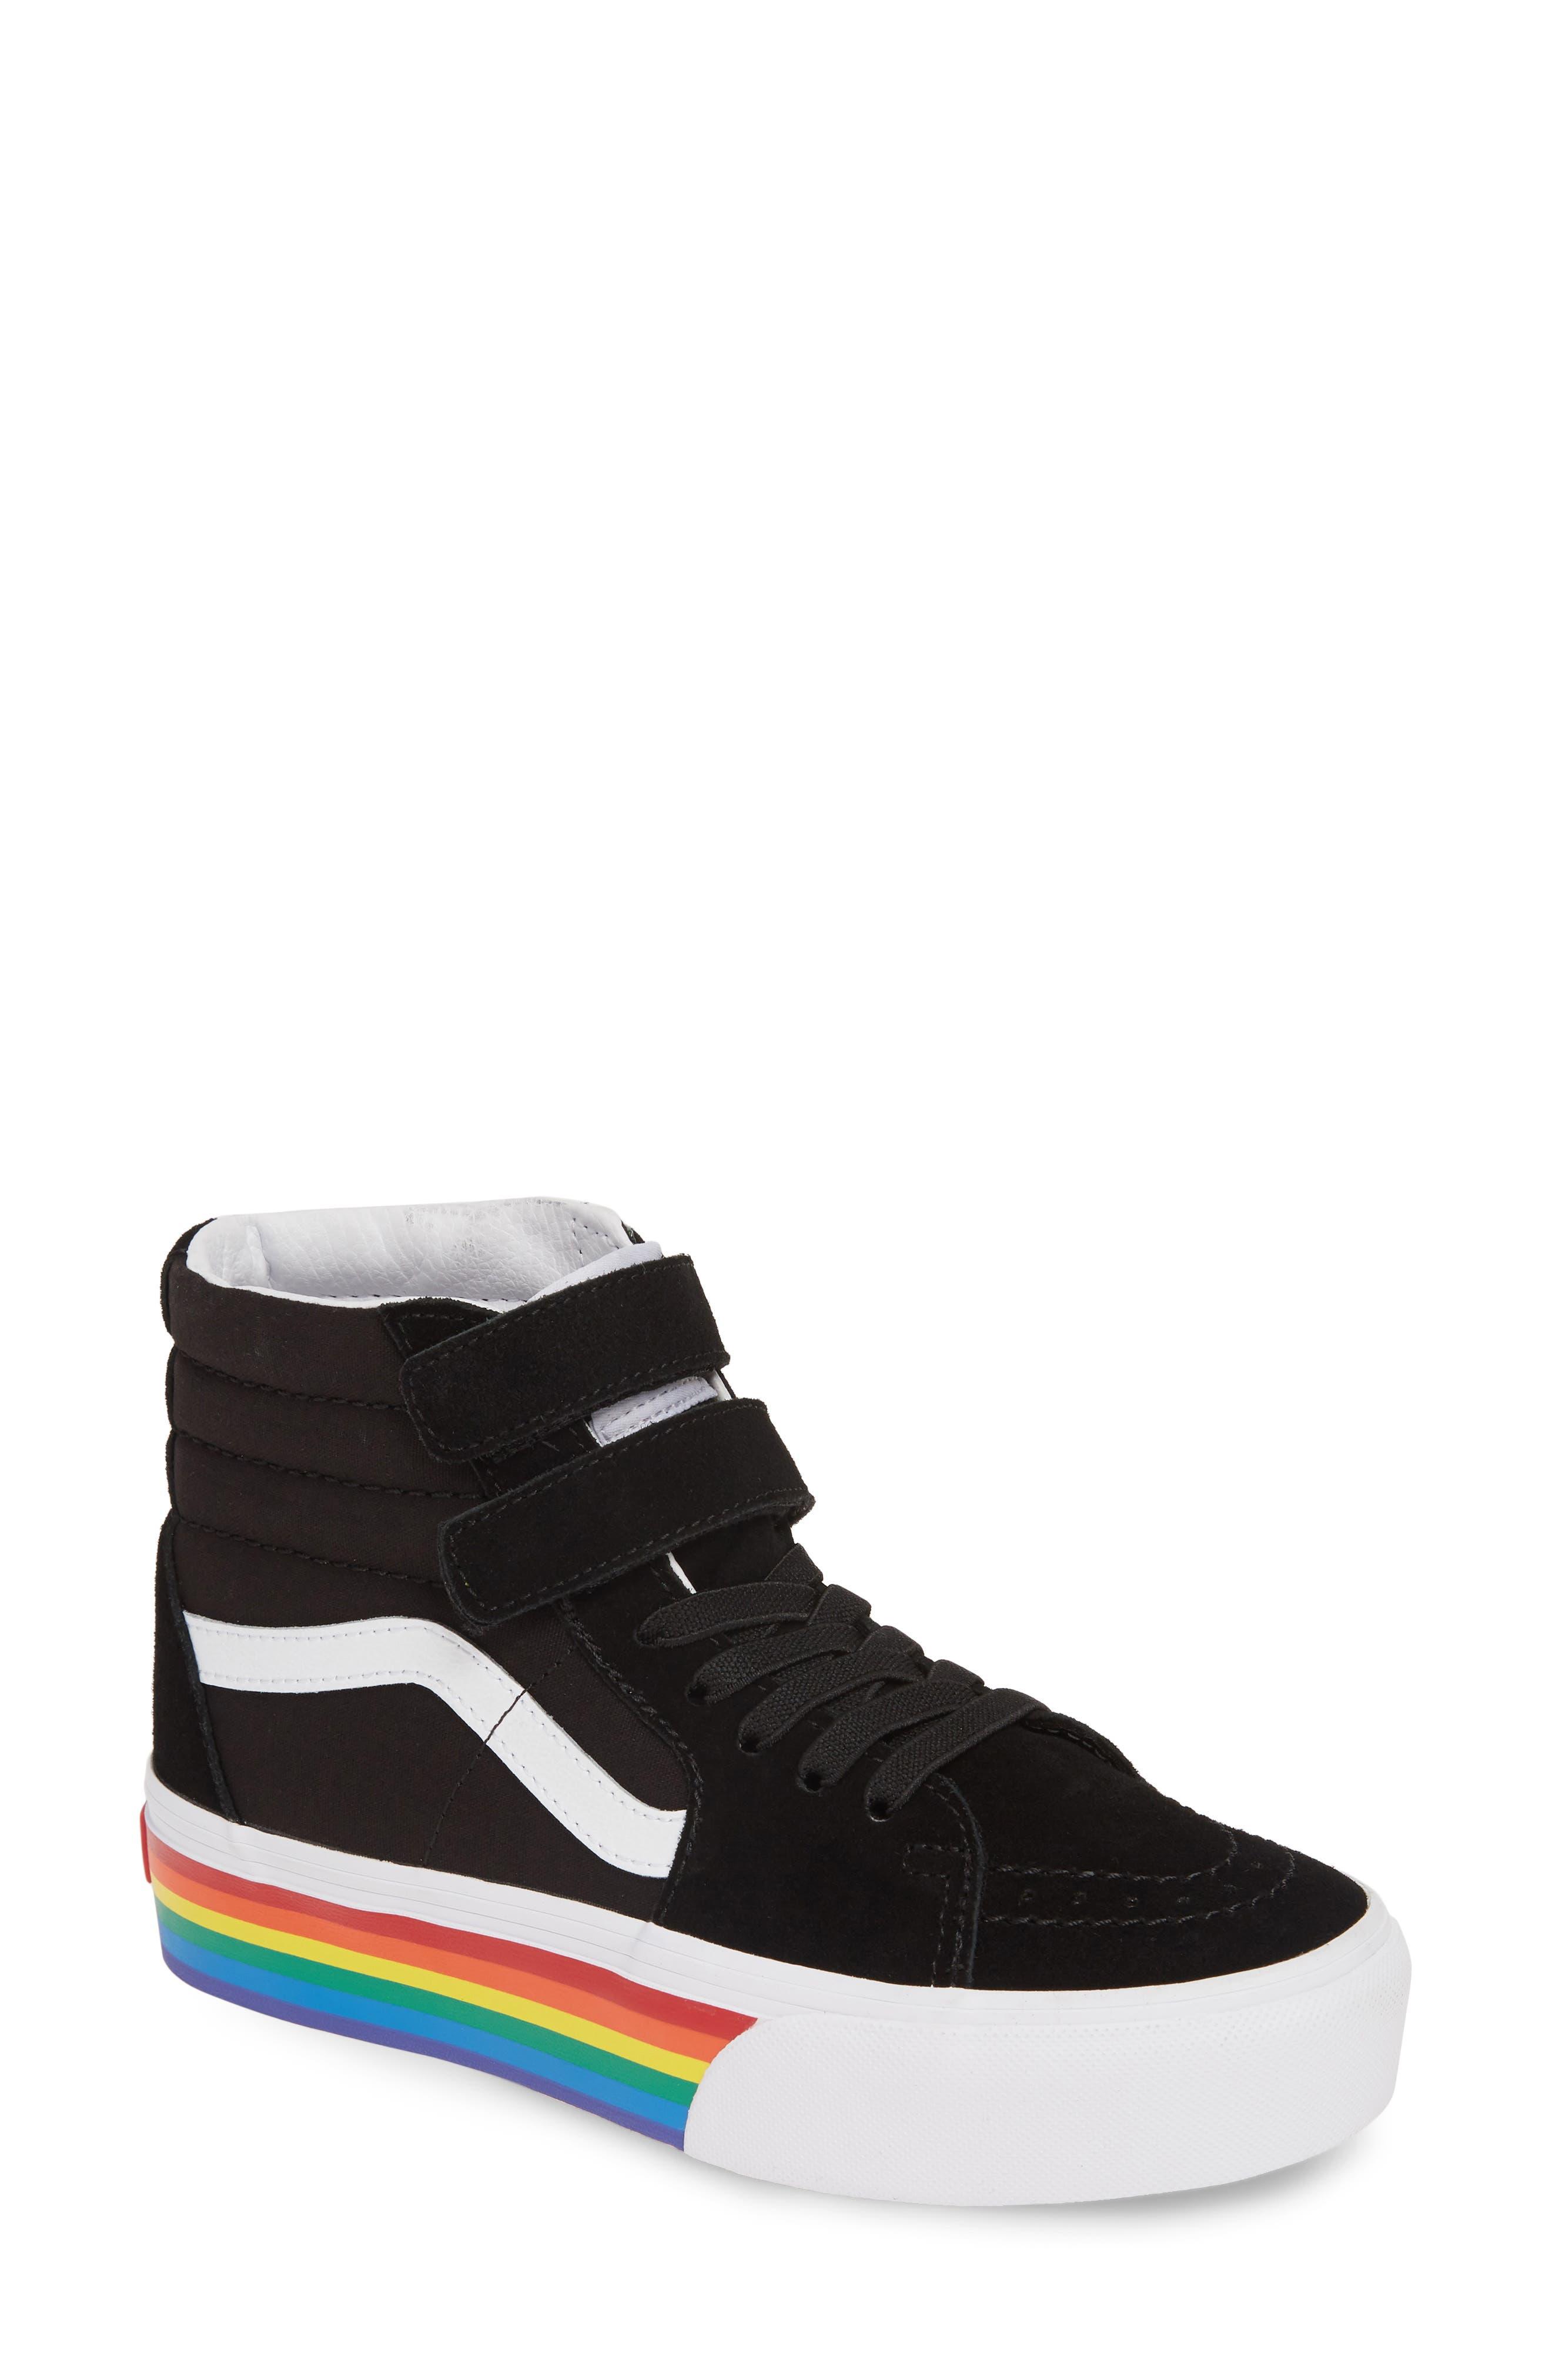 Vans Sk8-Hi V Rainbow Platform Sneaker- Black